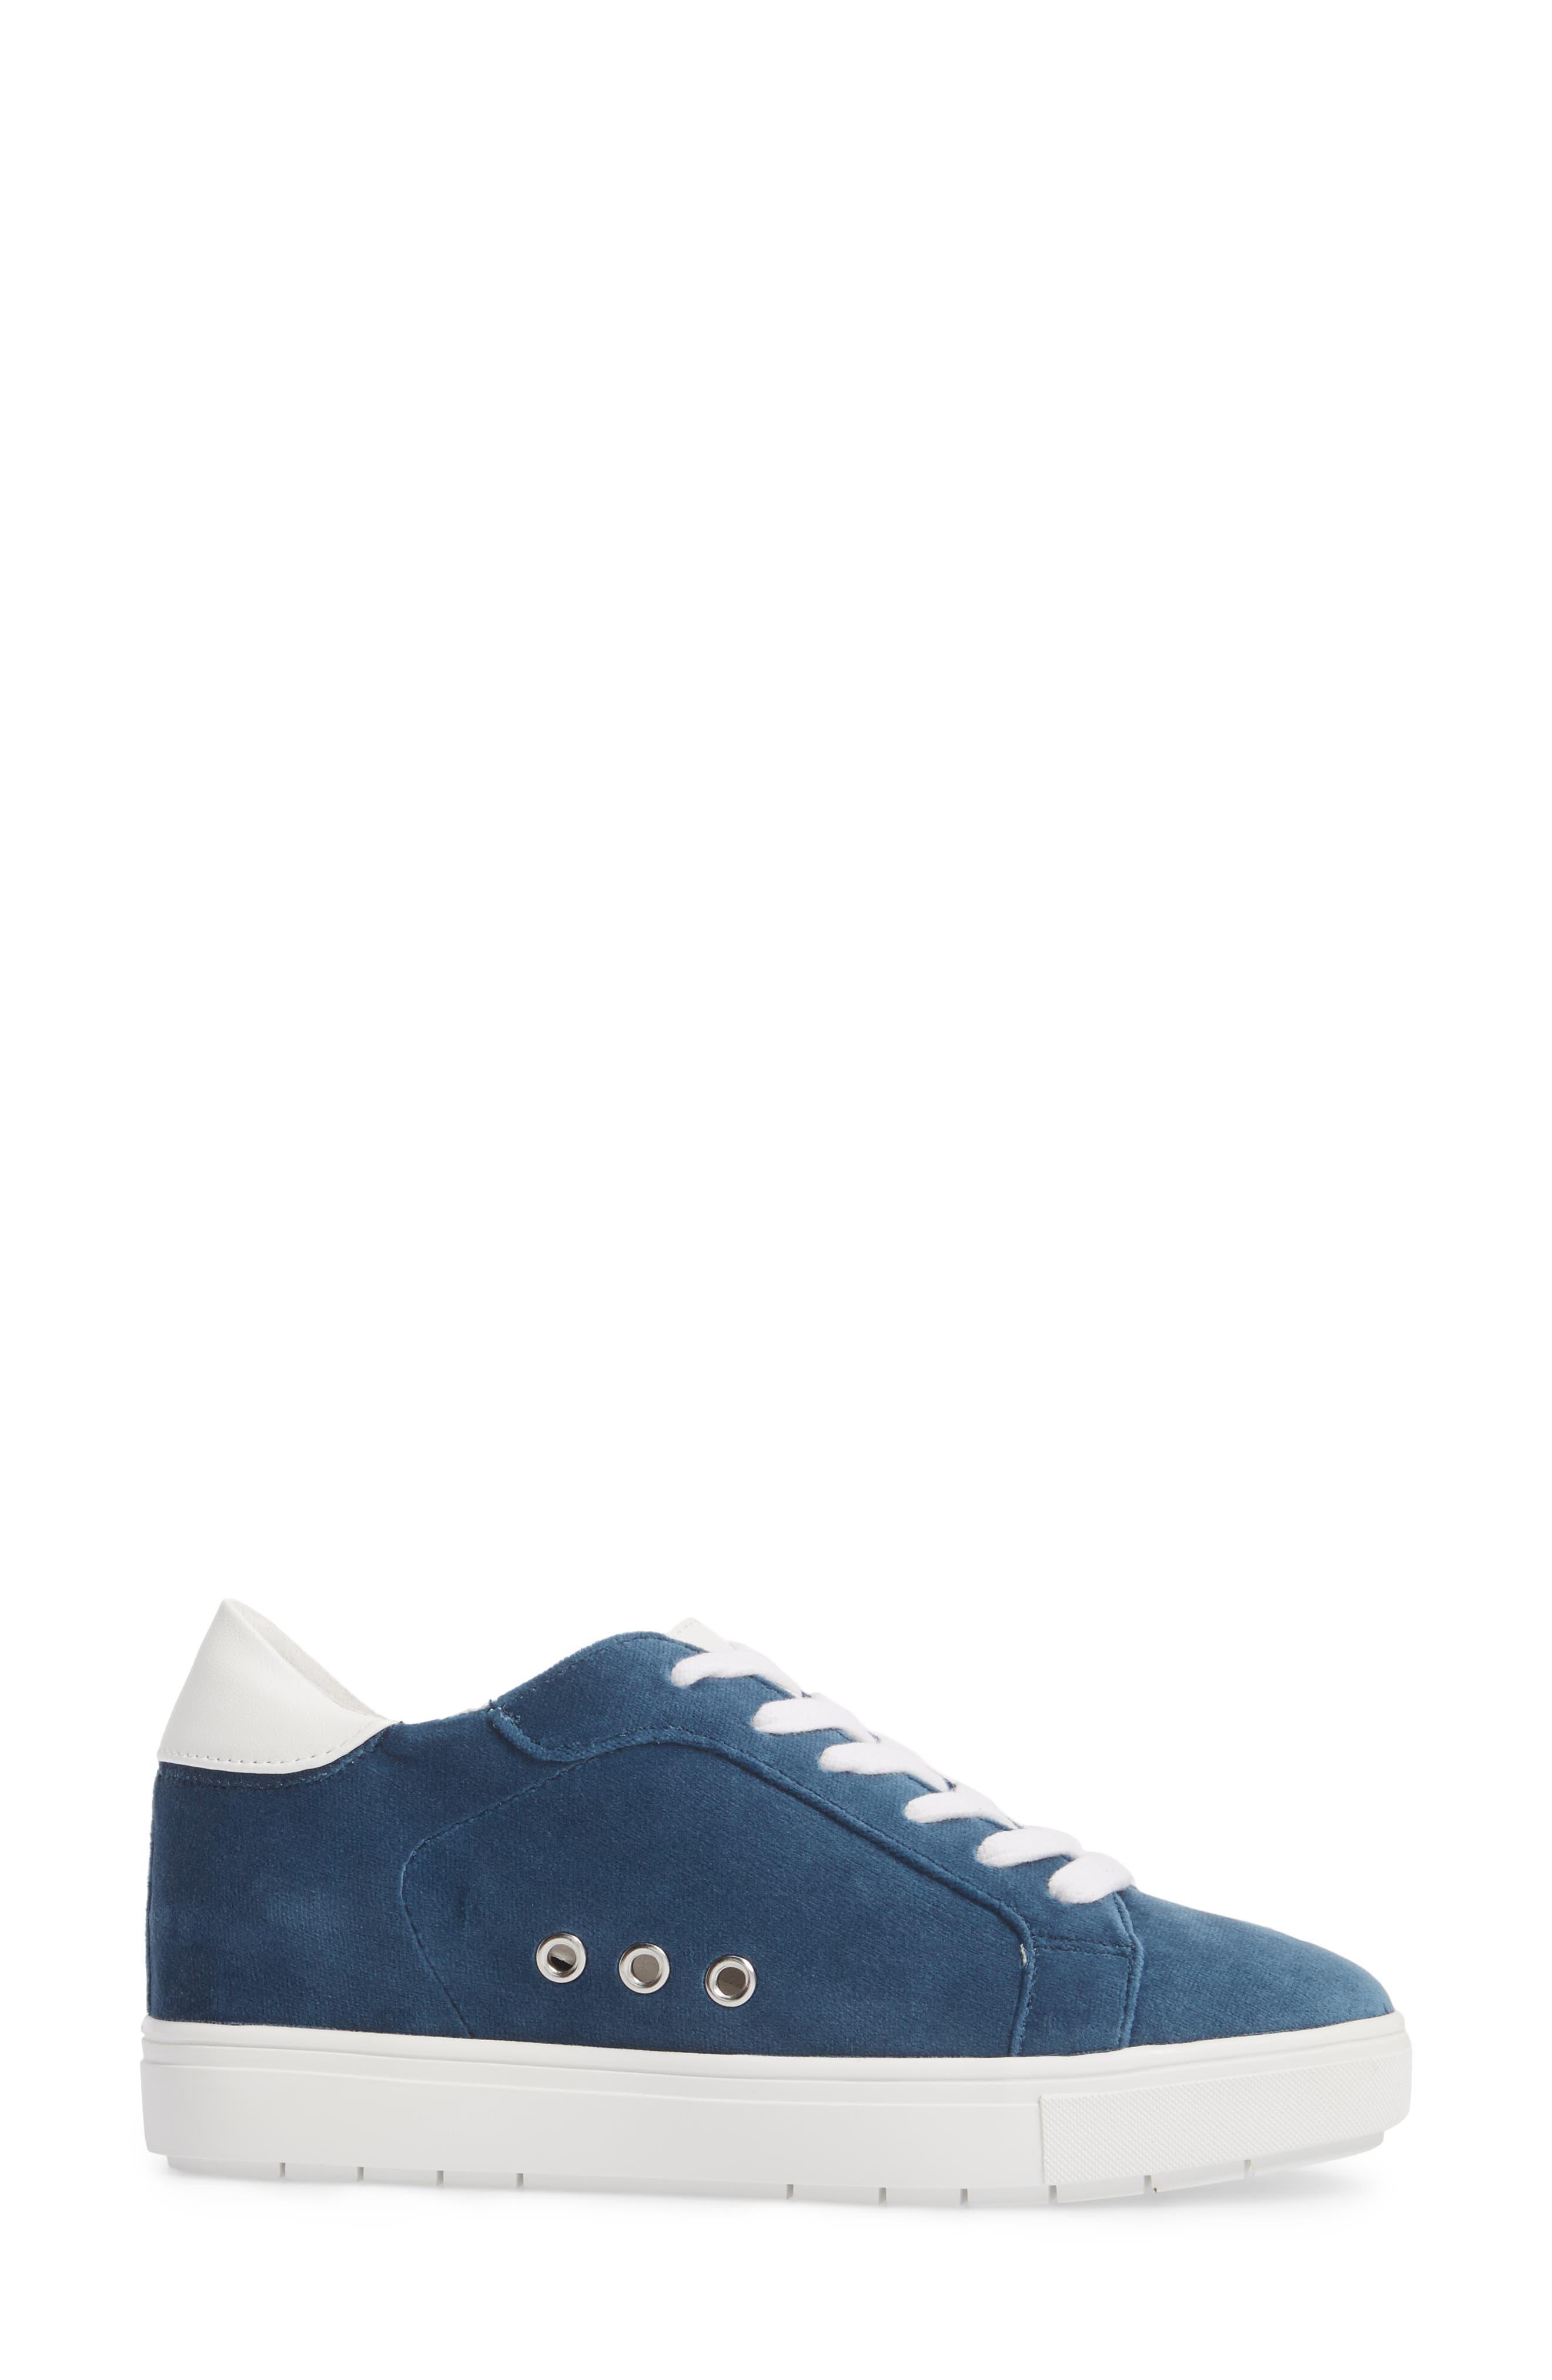 Alternate Image 3  - Steve Madden Steal Concealed Wedge Sneaker (Women)